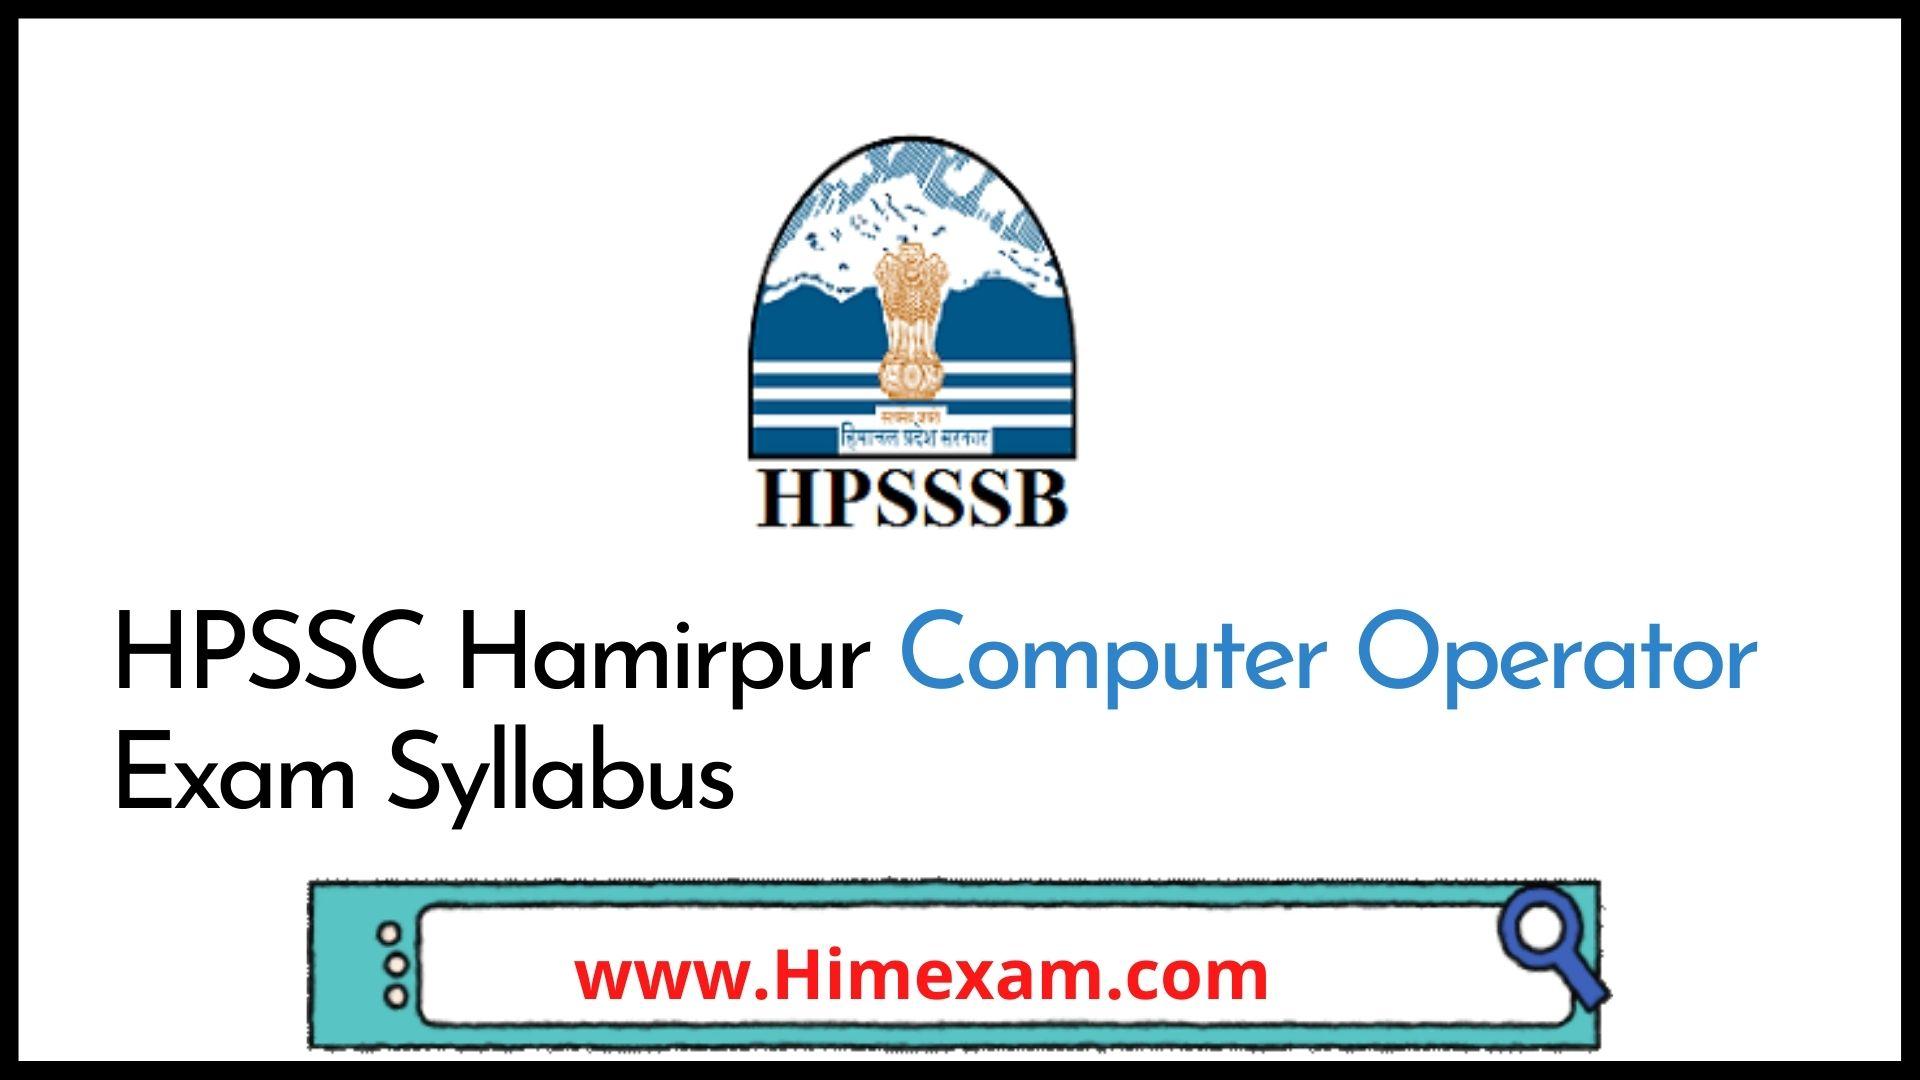 HPSSC Hamirpur Computer Operator Exam Syllabus